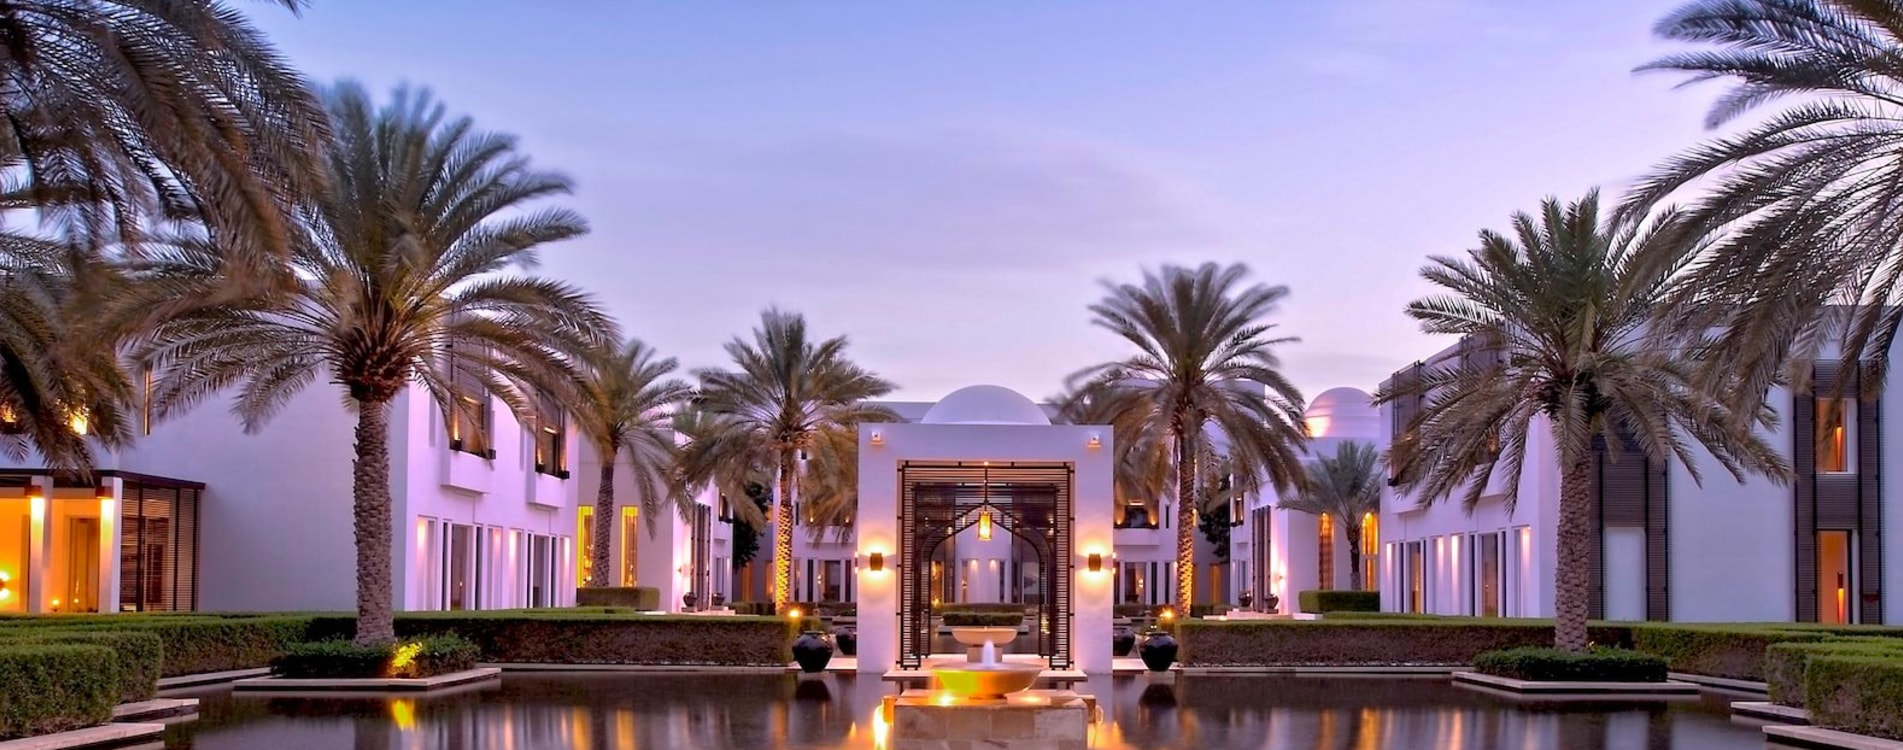 Chedi-Muscat-Water-Garden.jpg